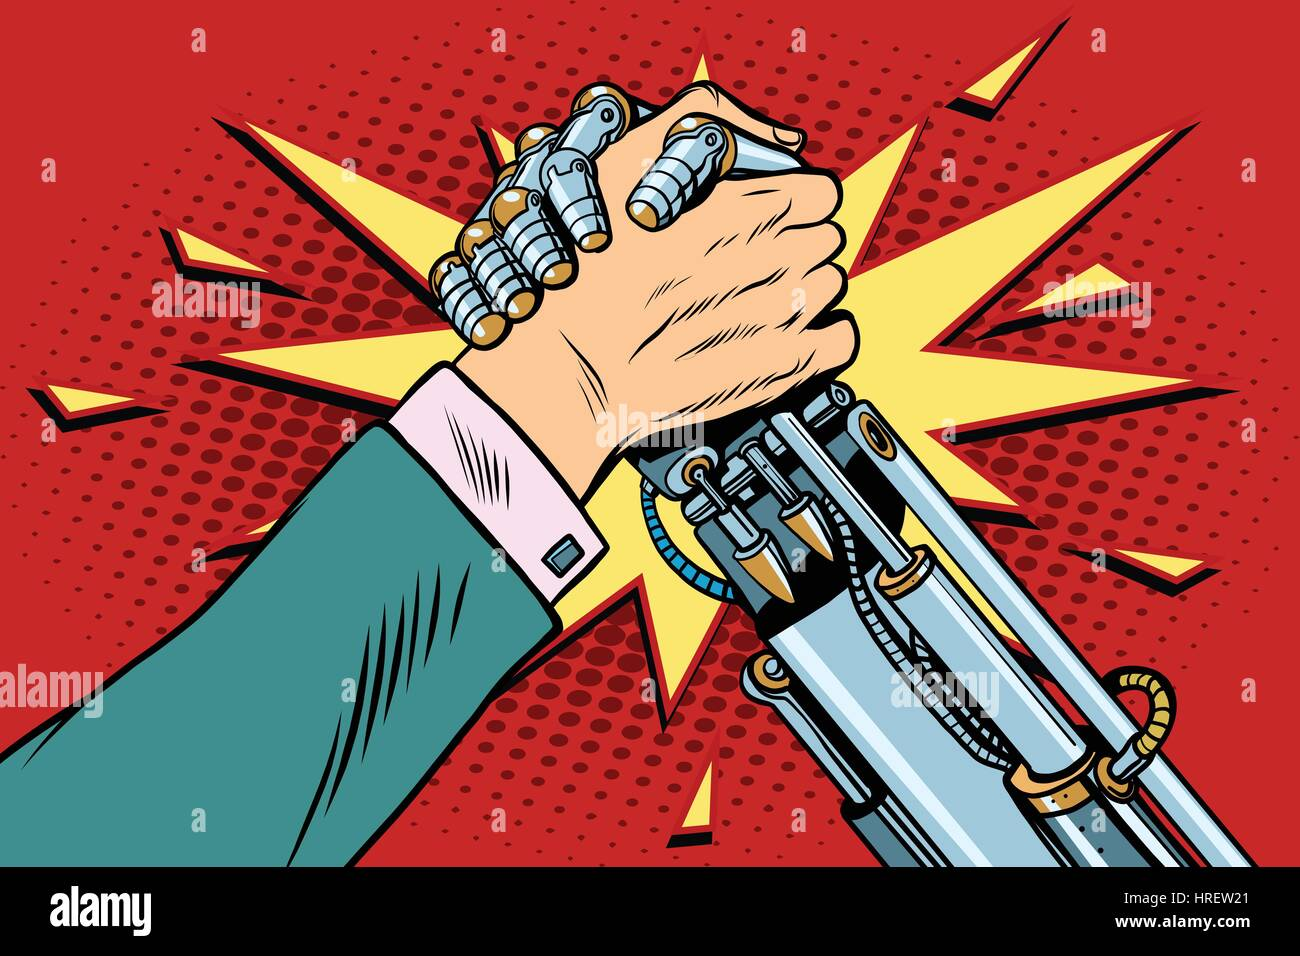 Man vs robot Arm wrestling fight confrontation, pop art retro vector illustration. New technology progress - Stock Image